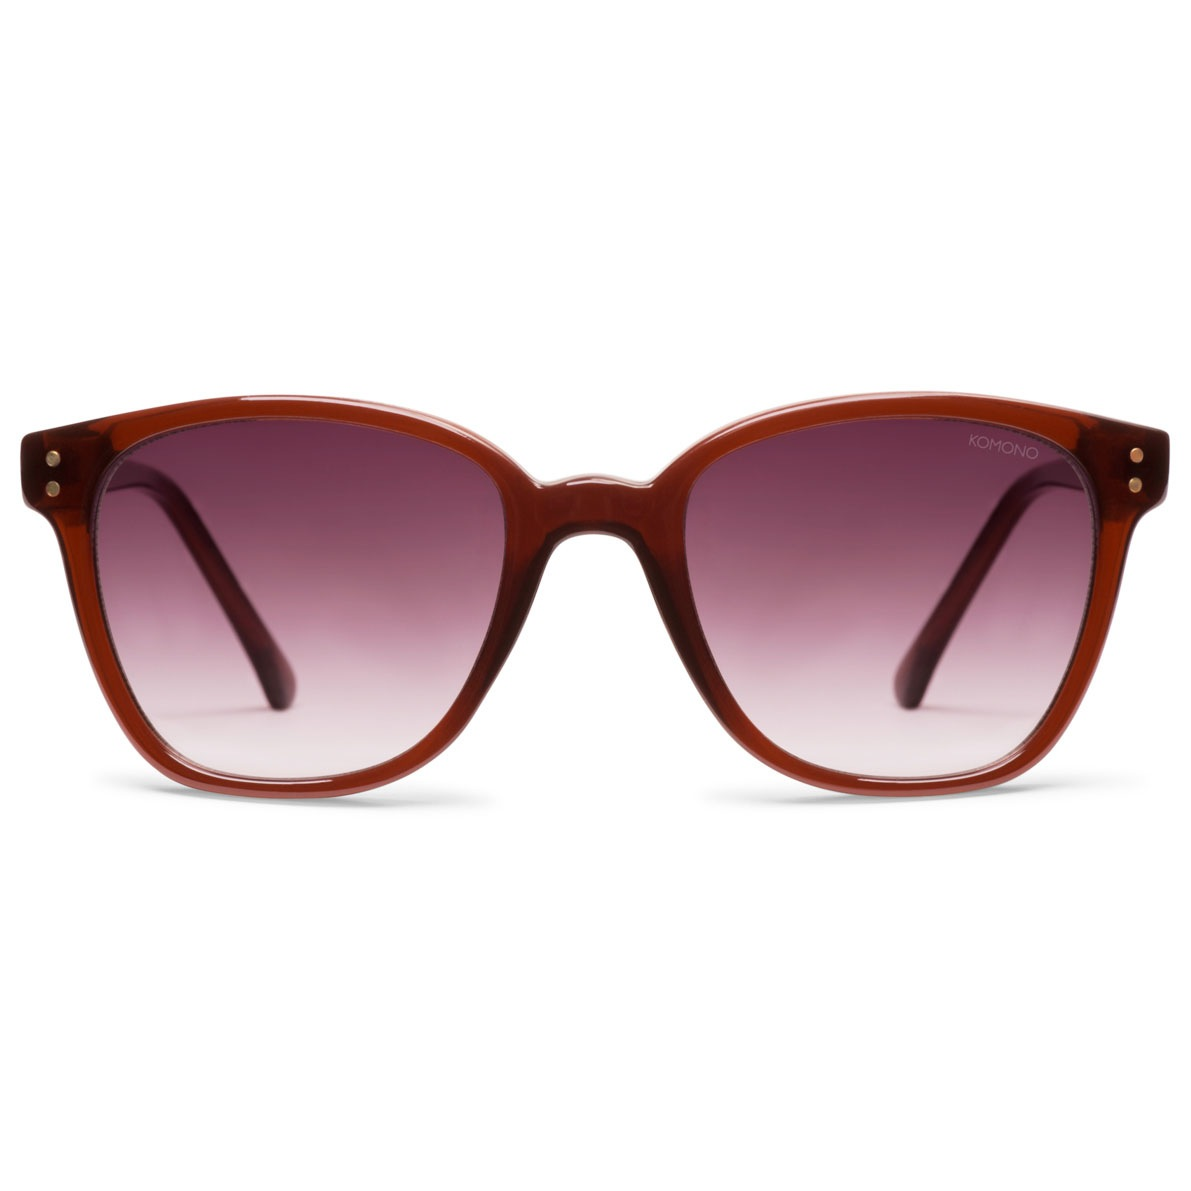 Солнцезащитные очки Komono Renee Cola